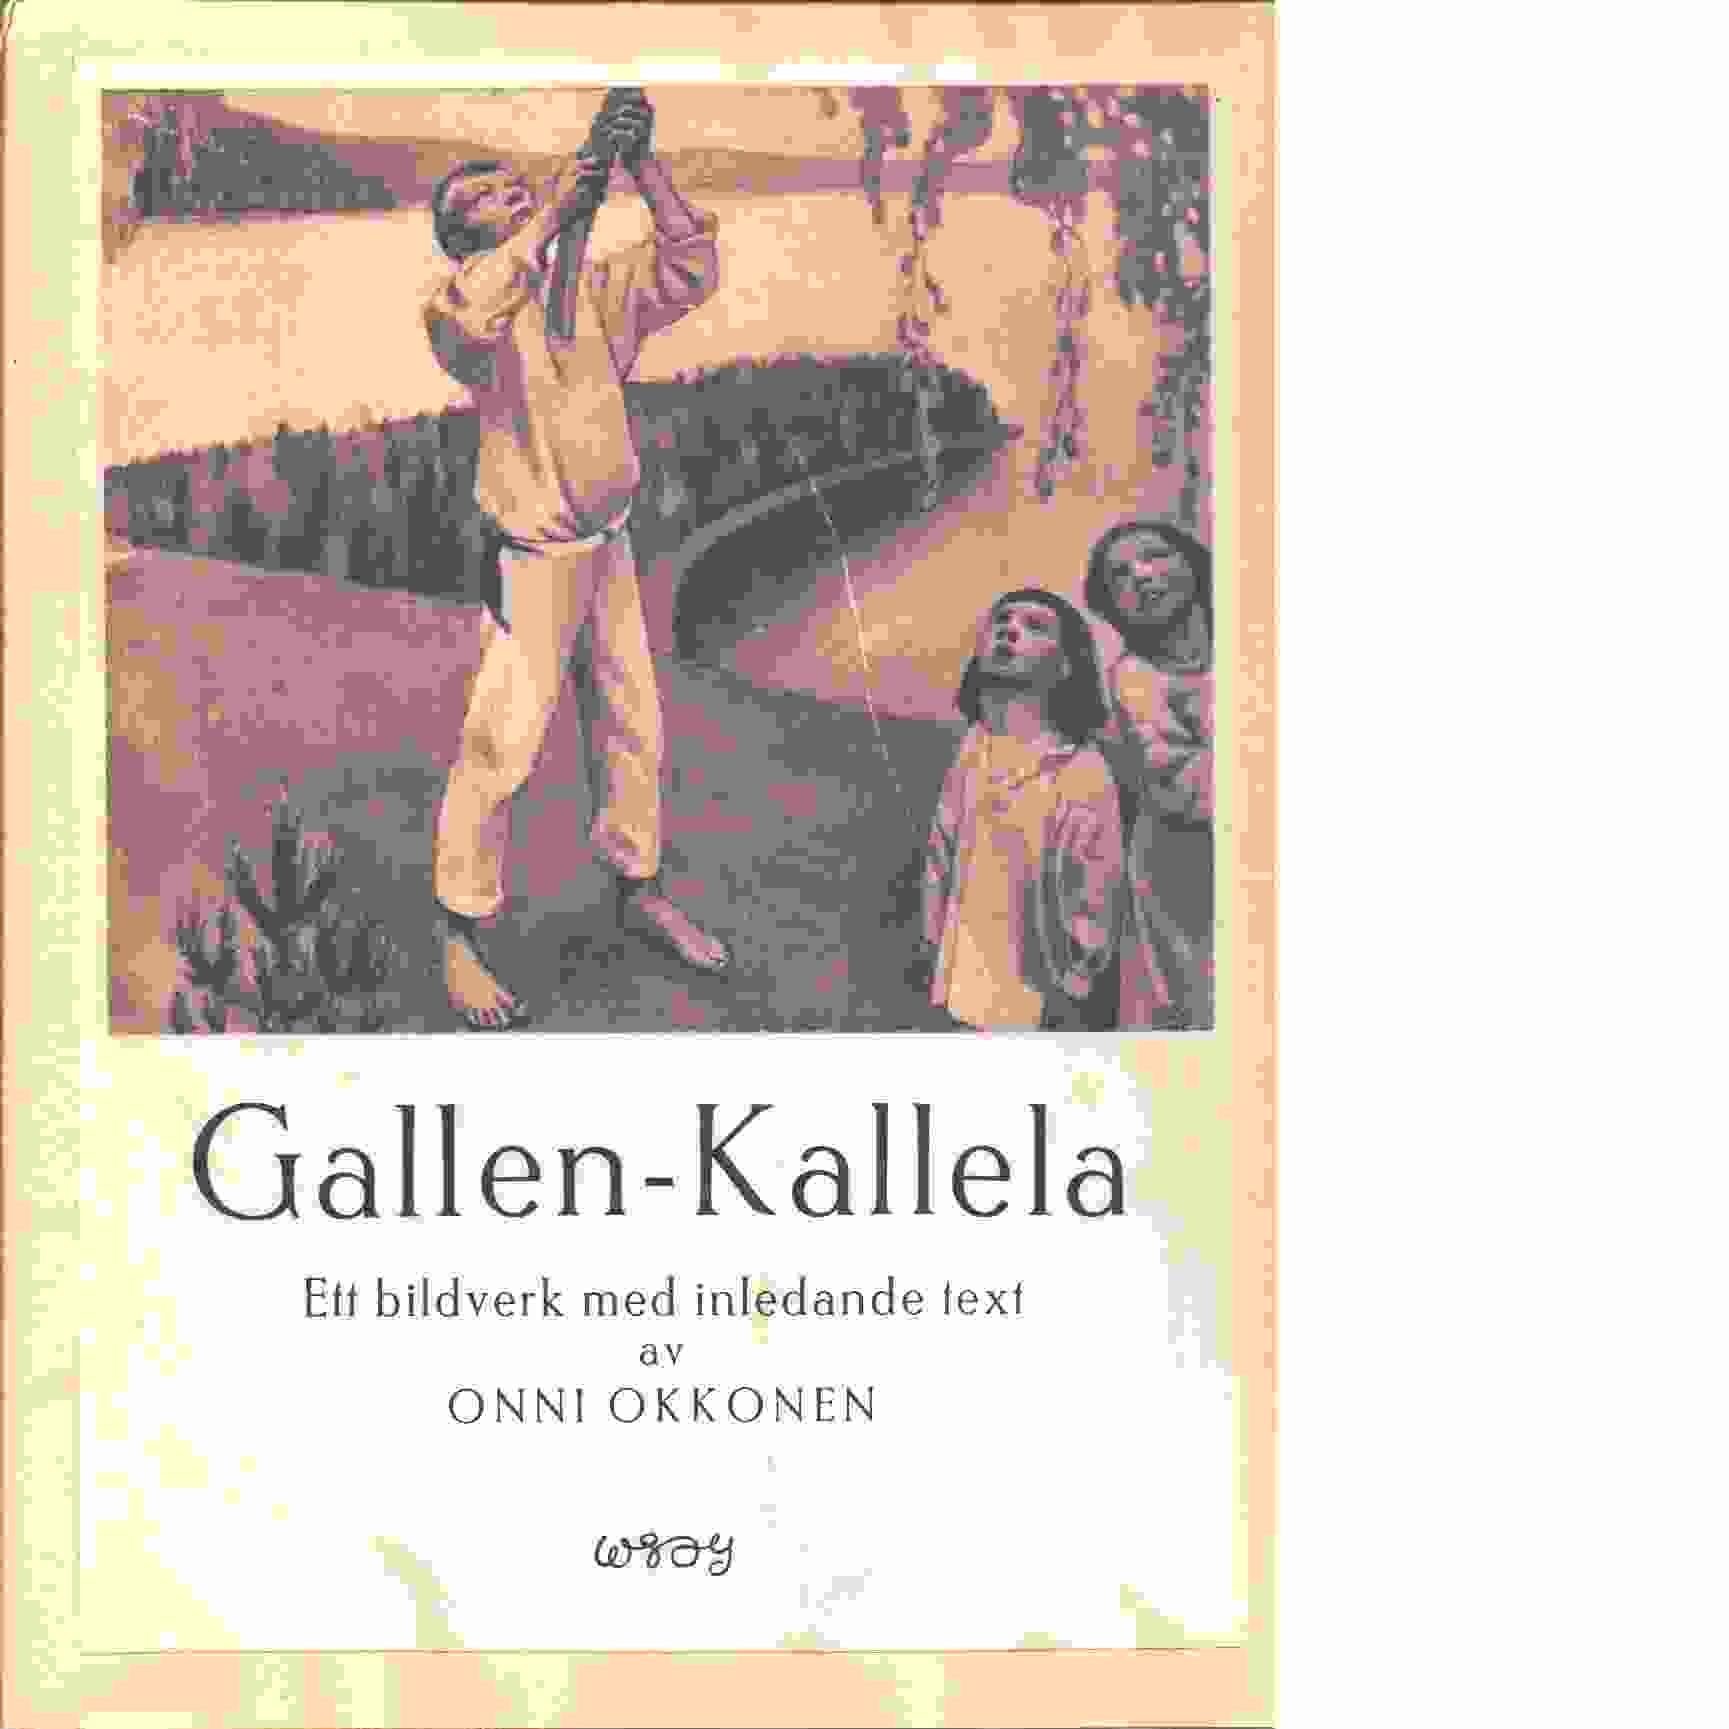 Axel Gallen-Kallela : ett bildverk / med inledande text av Onni Okkonen - Gallen-Kallela, Akseli